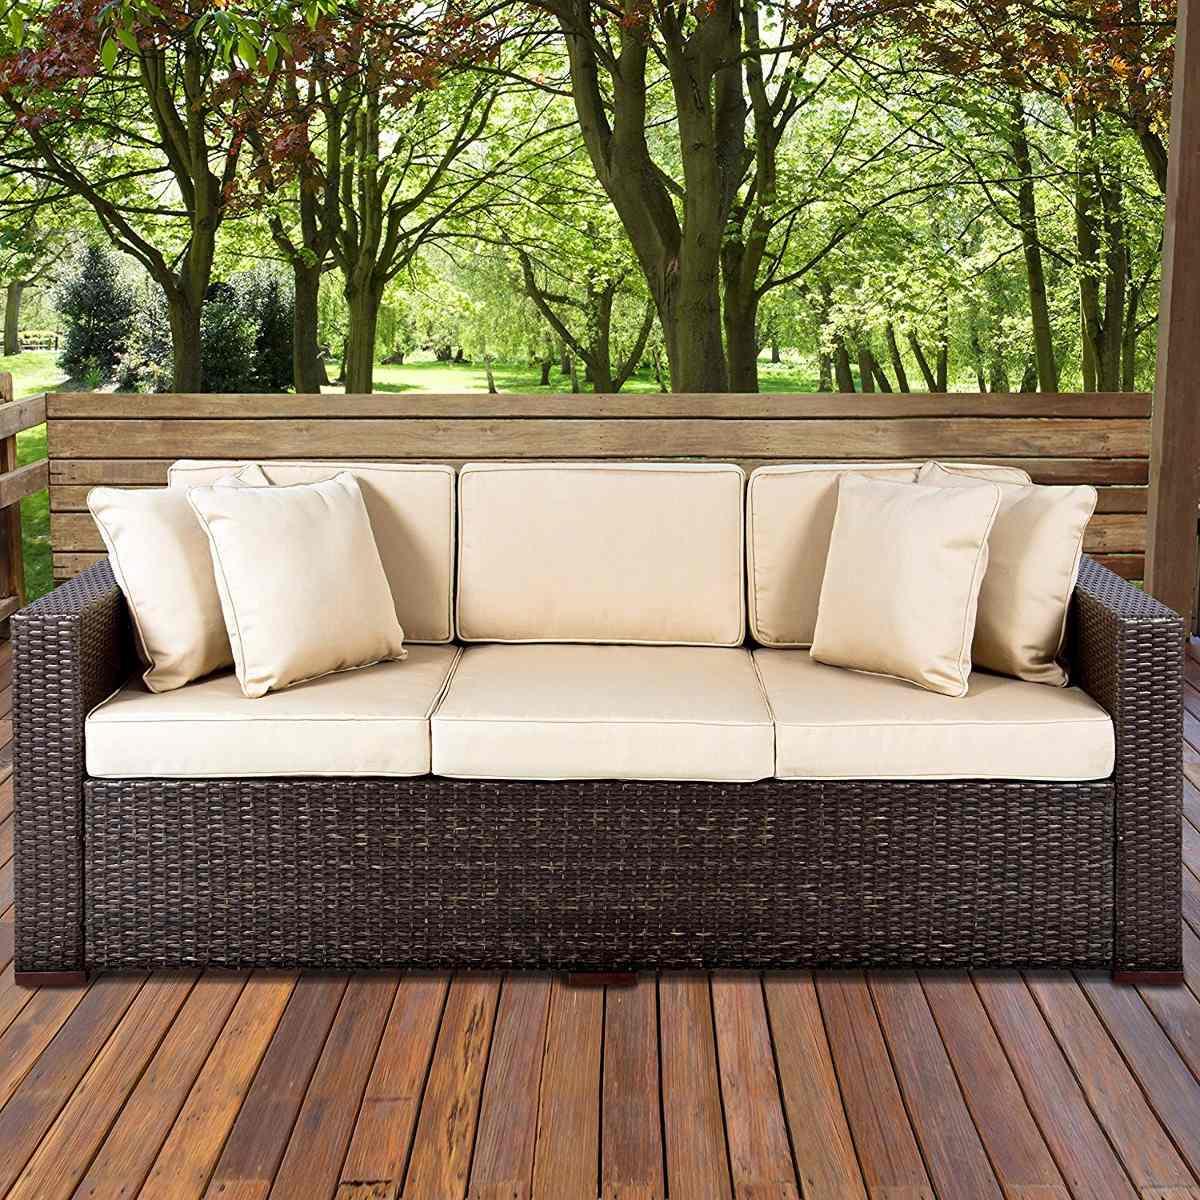 Sofa de 3 plazas exterior en mimbre en for Sofa exterior plegable